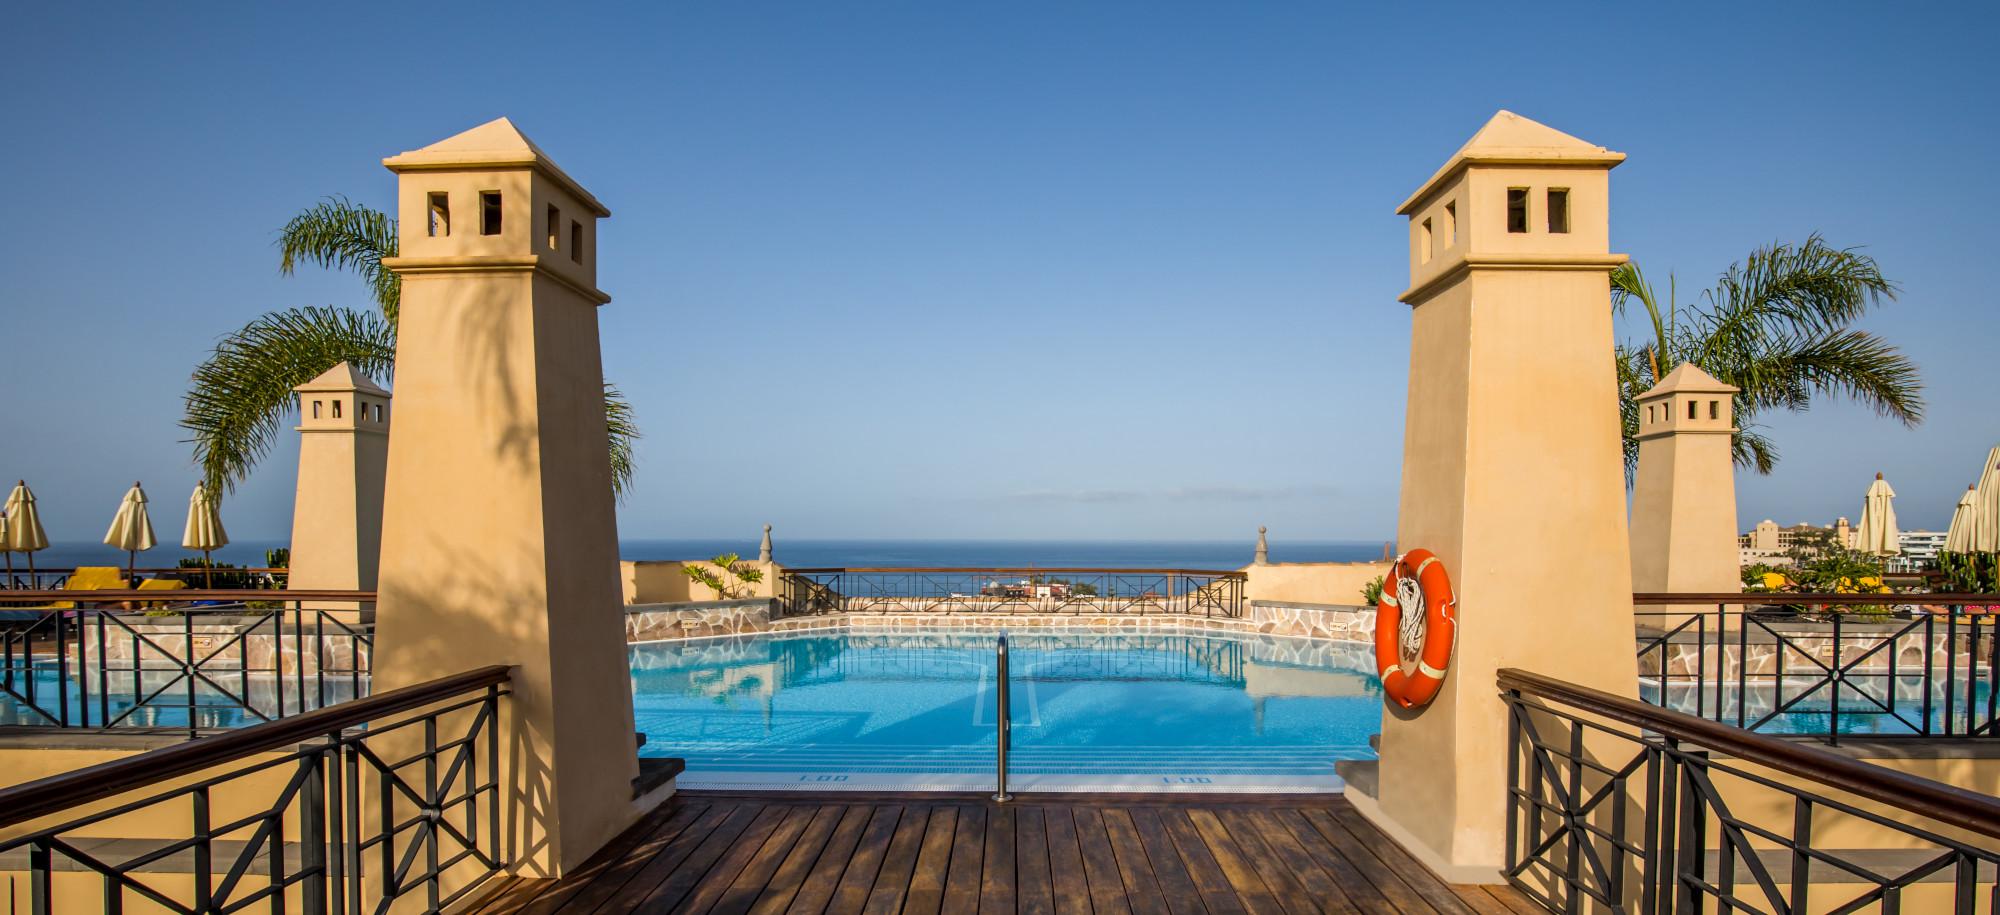 Costa-Adeje-Tenerife